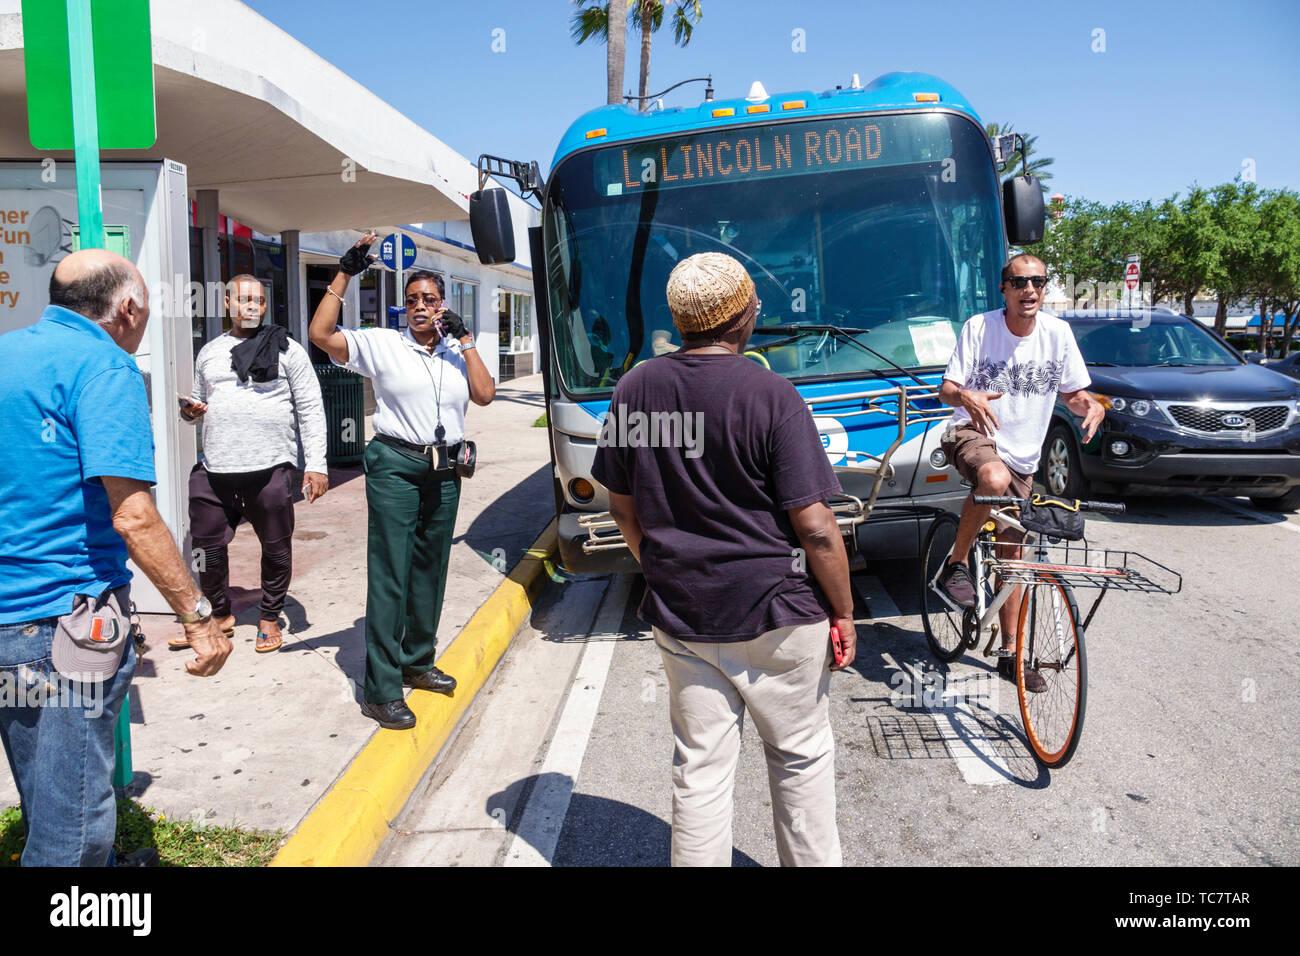 Miami Beach Florida North Beach Miami-Dade Metrobus bus public transportation disruption dispute confrontation taking law into own hands Hispanic man Stock Photo